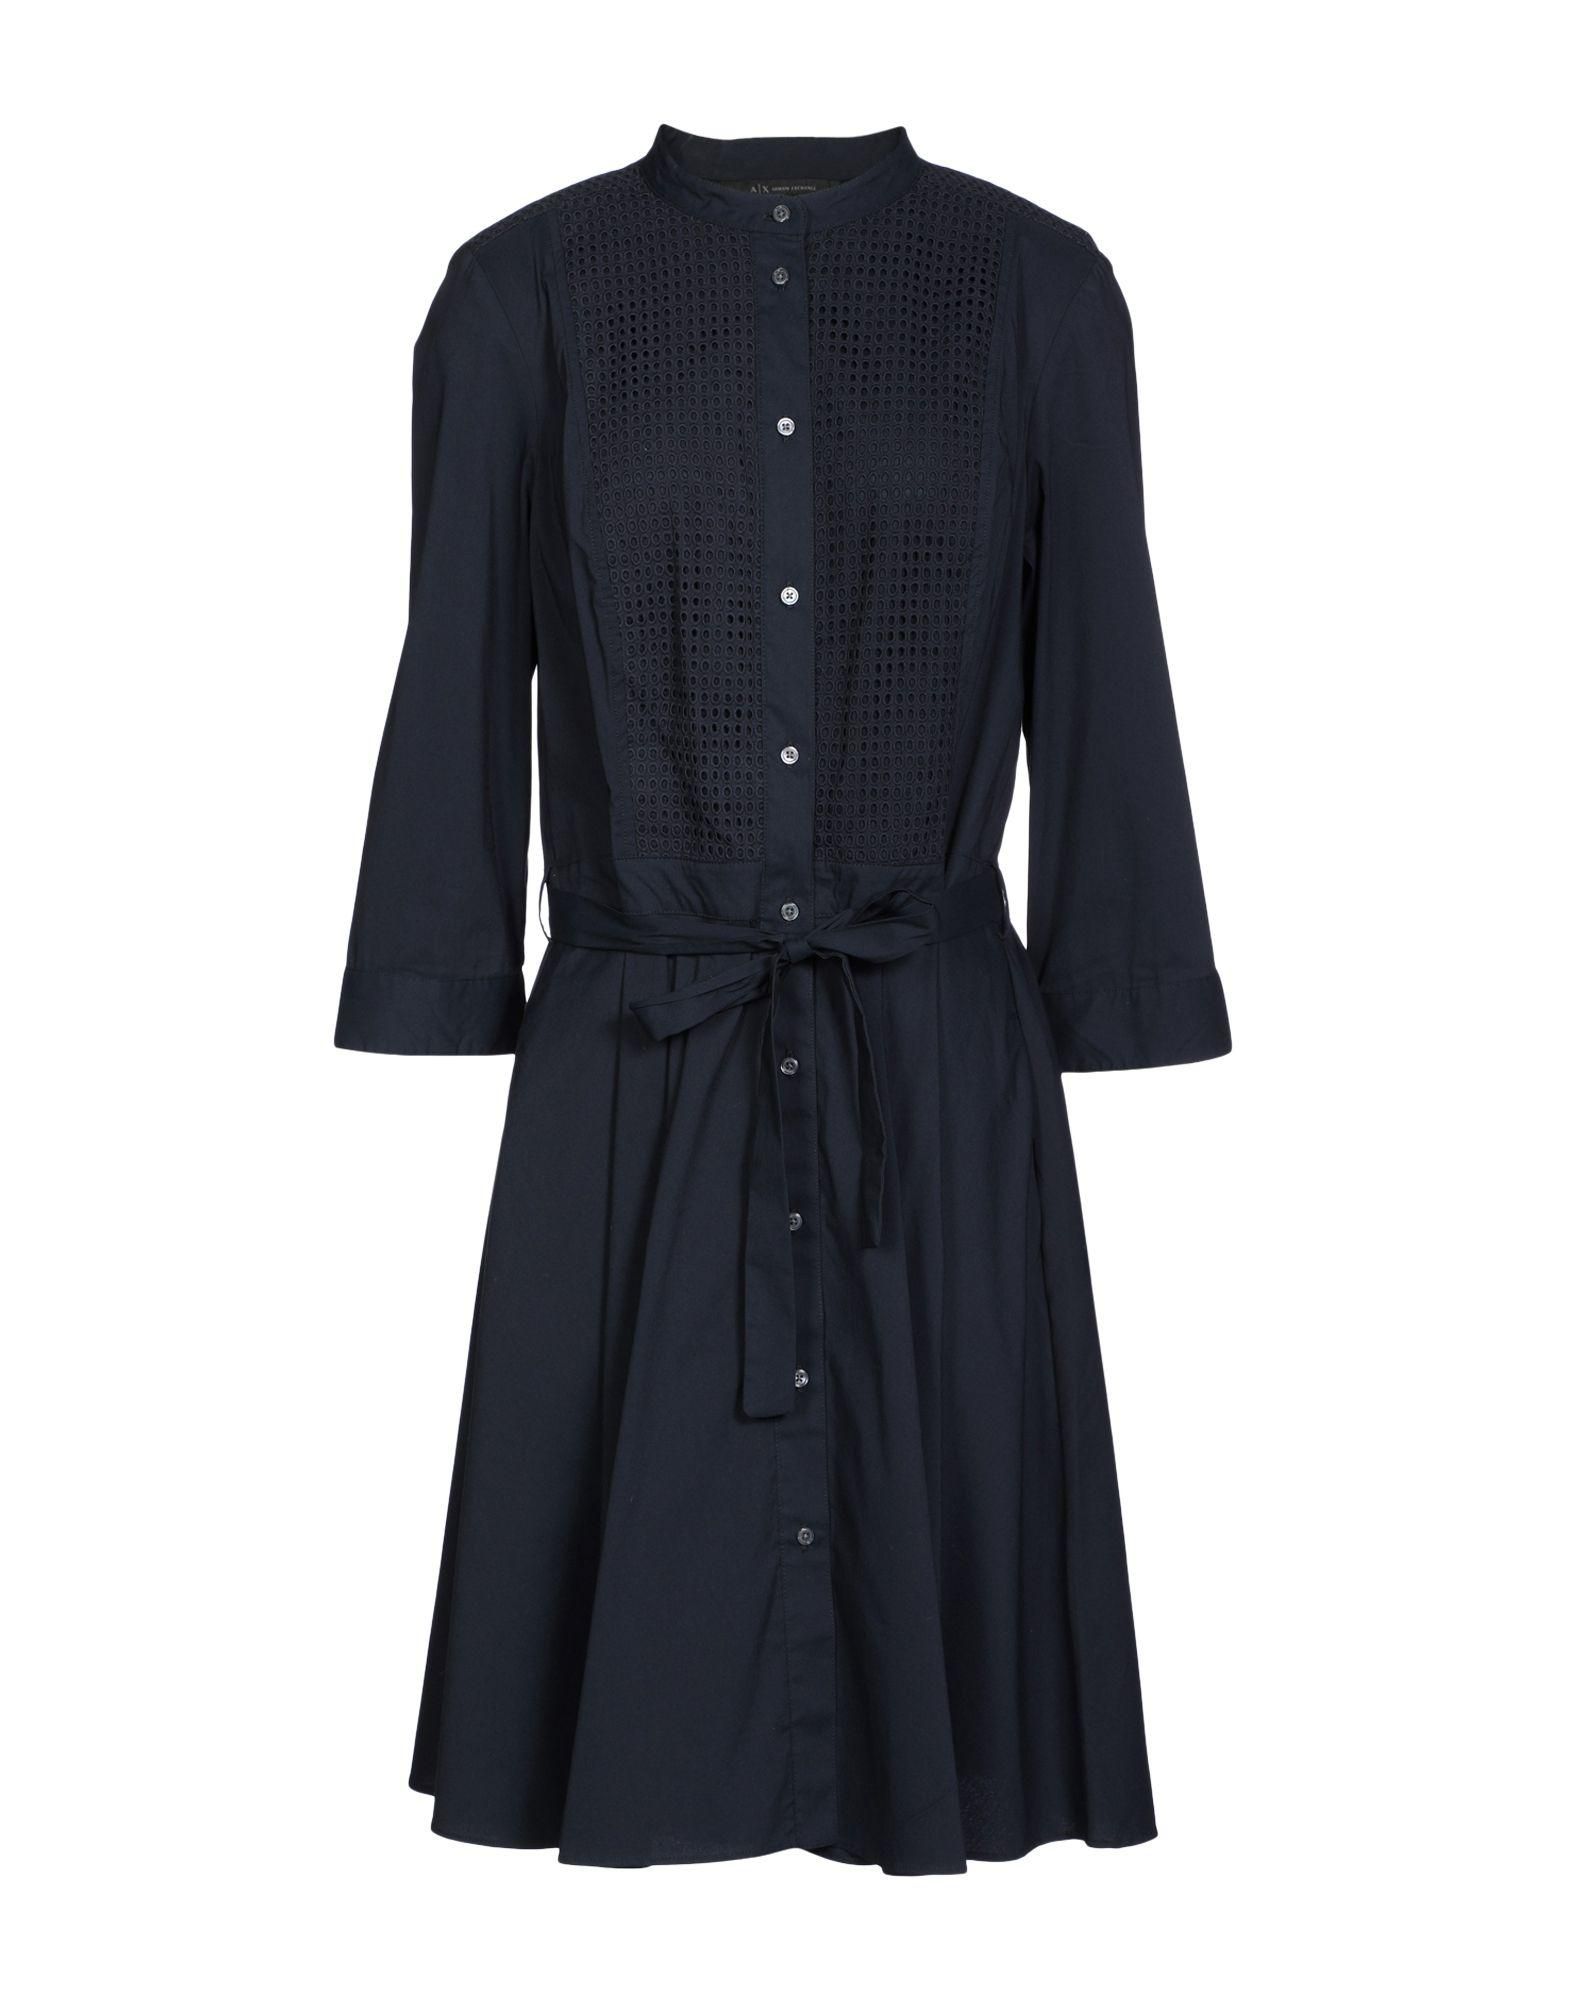 Armani Exchange Knee-length Dresses In Black